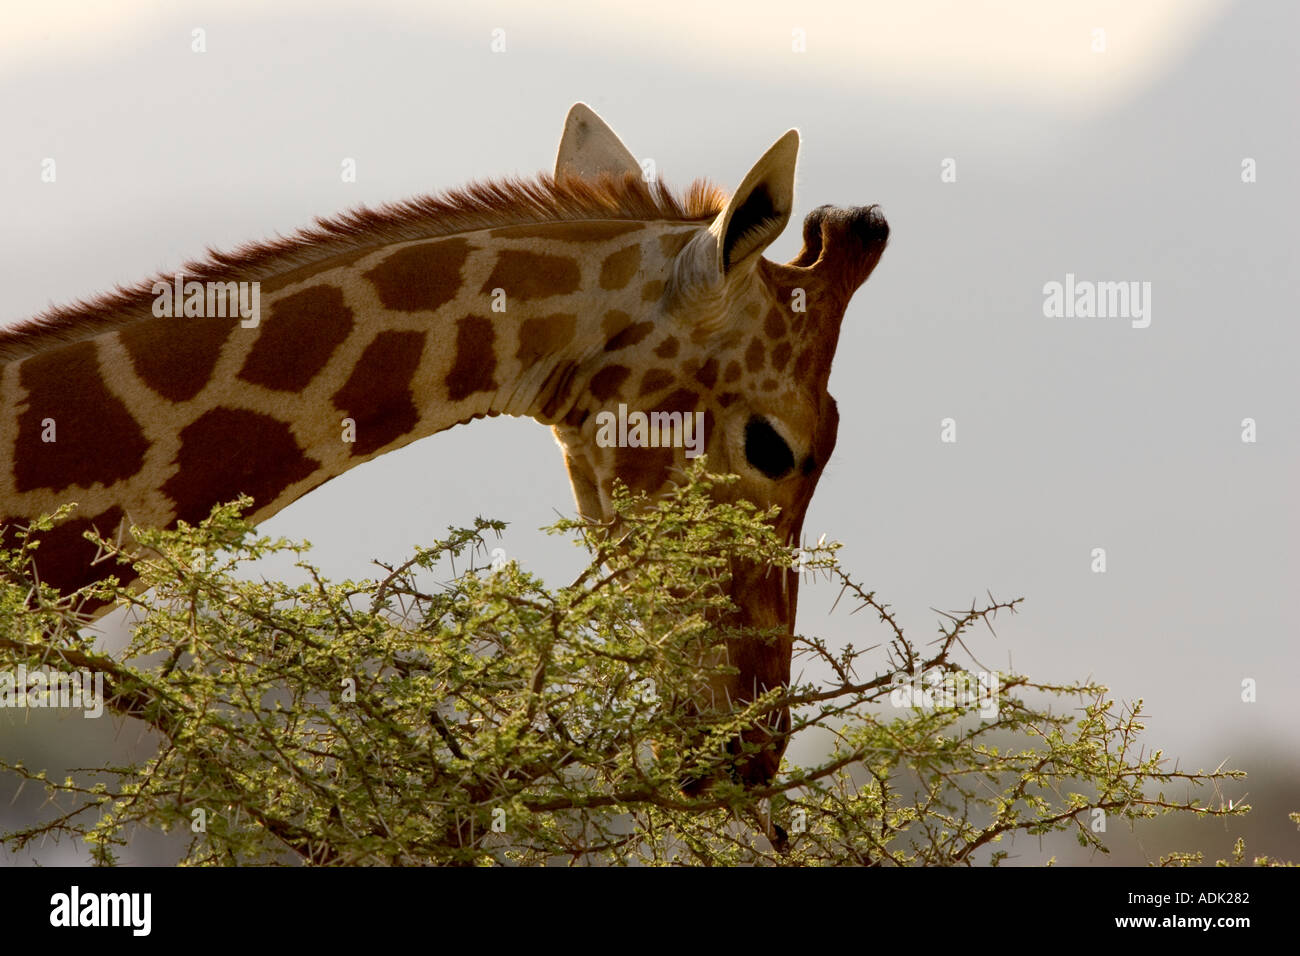 samburu reserve Kenya Africa - Stock Image